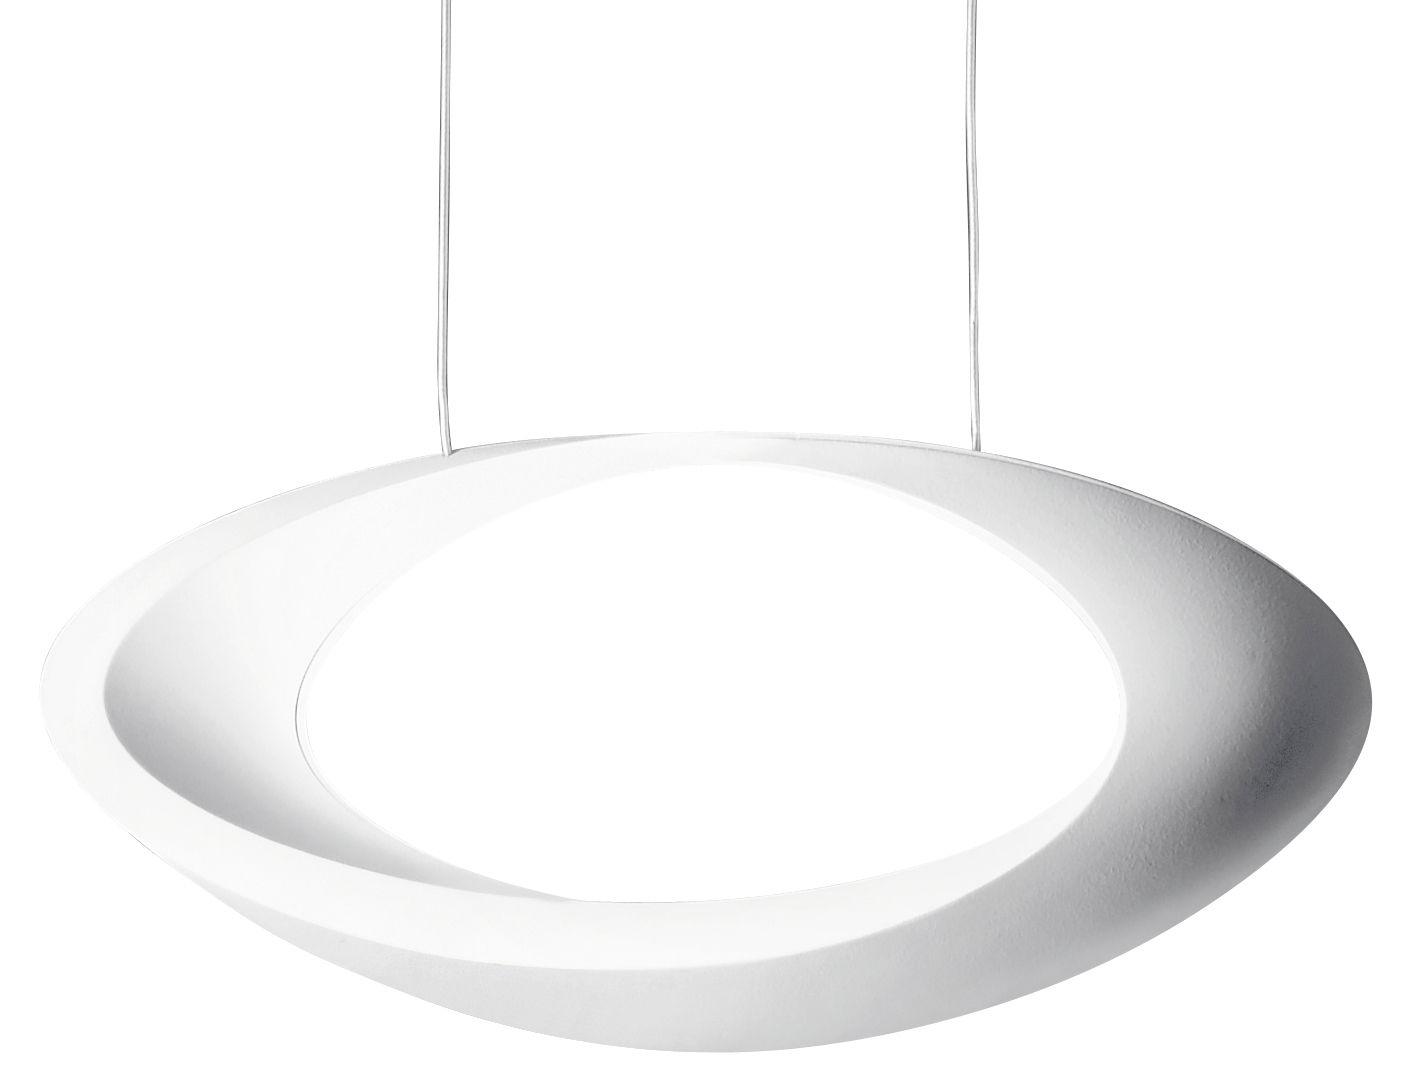 Leuchten - Pendelleuchten - Cabildo LED Pendelleuchte - Artemide - Weiß - bemaltes Aluminium